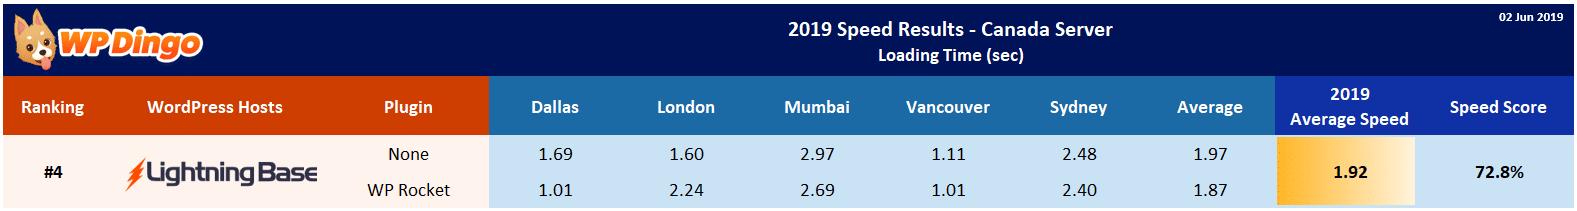 2019 Lightning Base Speed Table - Canada Server